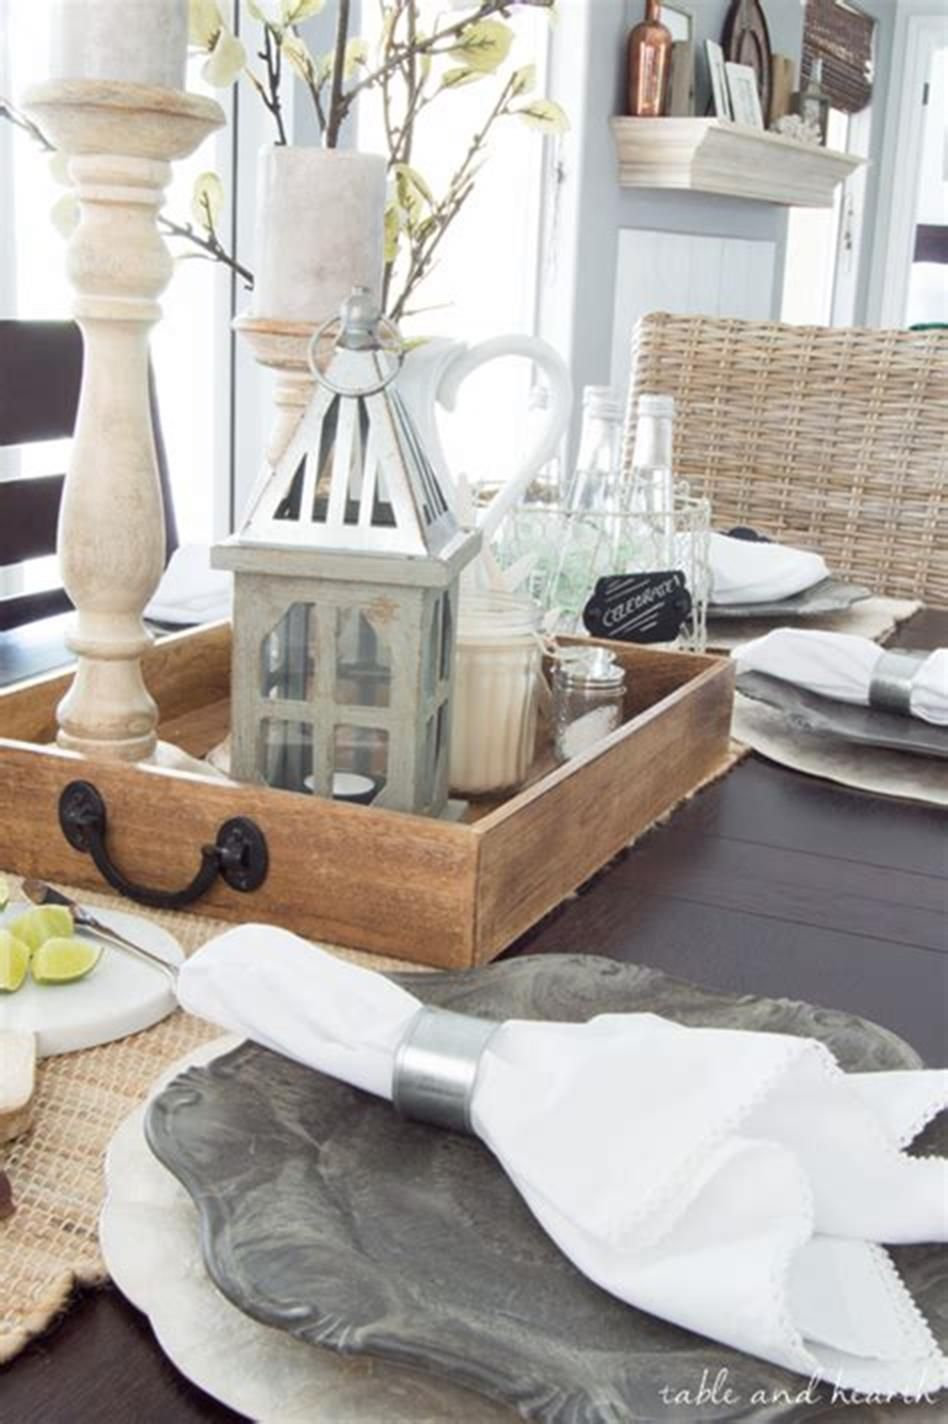 40 Beautiful Farmhouse Style Tray Decor Ideas 28 Farmhouse Table Centerpieces Farmhouse Table Decor Farmhouse Table Setting